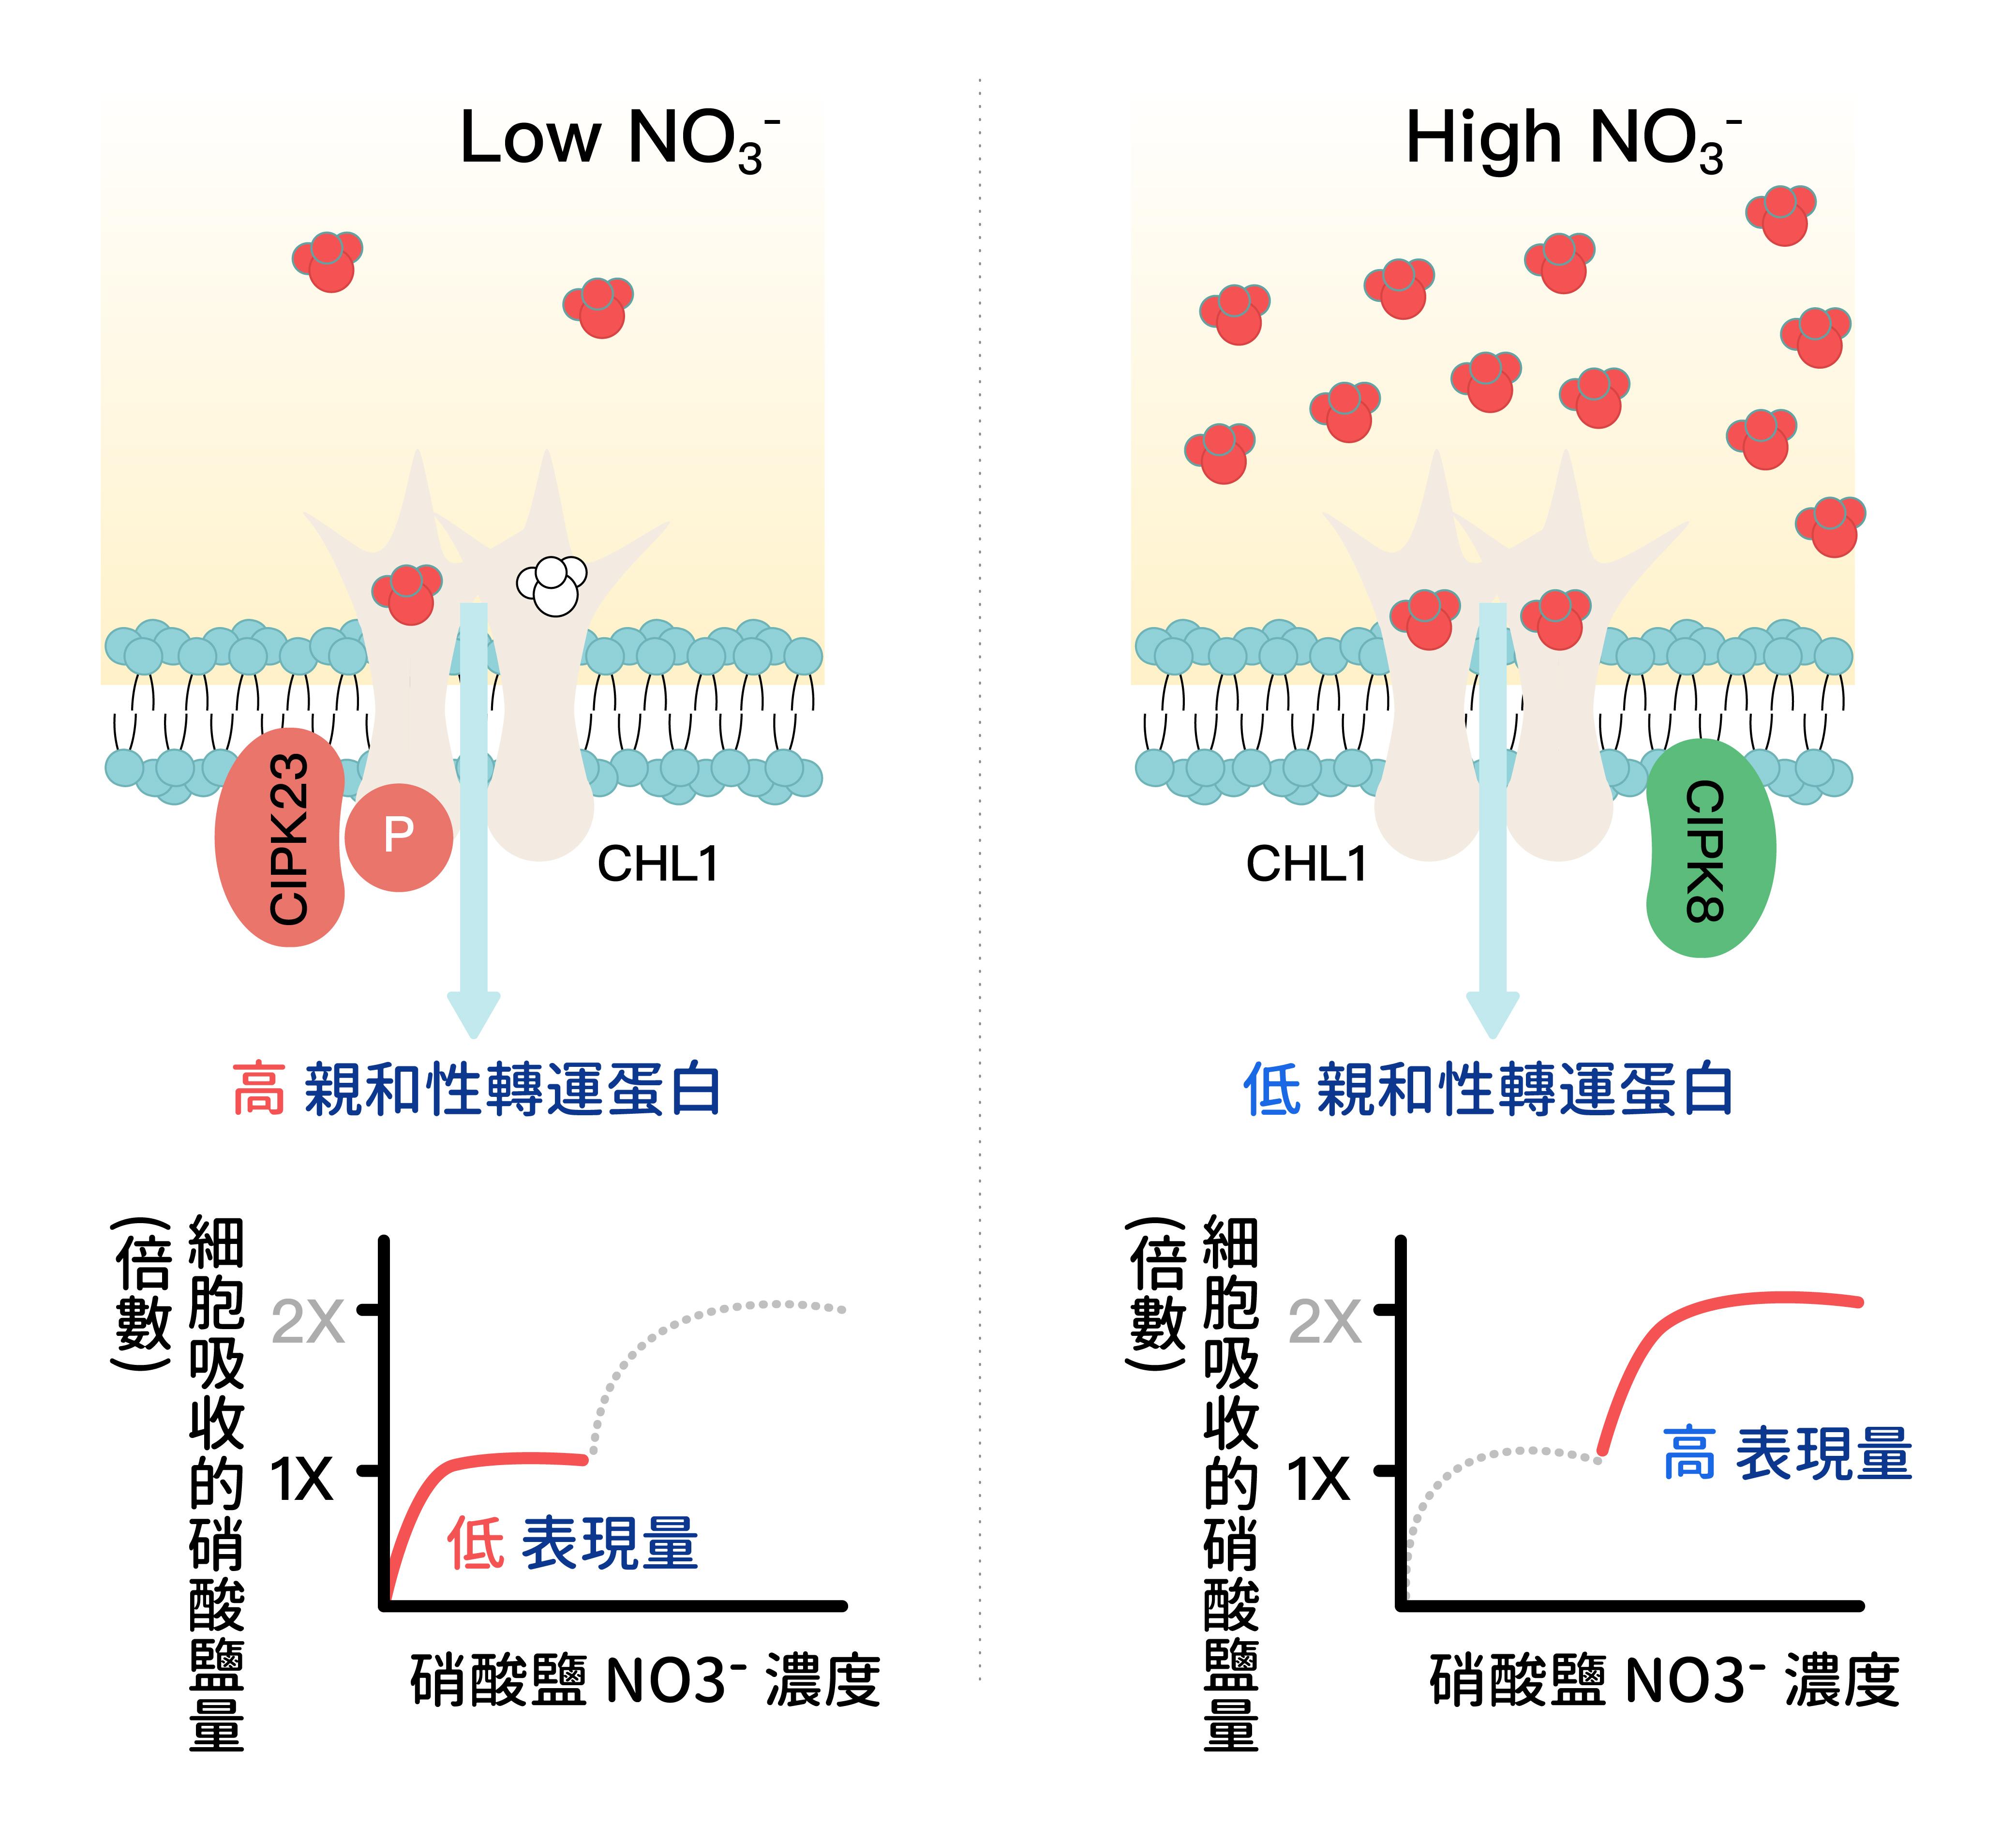 (左圖) 當環境中硝酸鹽濃度較低時,CHL1 會因磷酸化,而成為高親和性的轉運蛋白。(右圖) 當硝酸鹽濃度較高時,CHL1則被去磷酸化,以轉換成低親和性的轉運蛋白。圖│K.-H. Liu and Y.-F. Tsay*. (2003) Switching between the two action modes of the dual-affinity nitrate transporter CHL1 by phosphorylation.EMBO J.22:1005-1013.